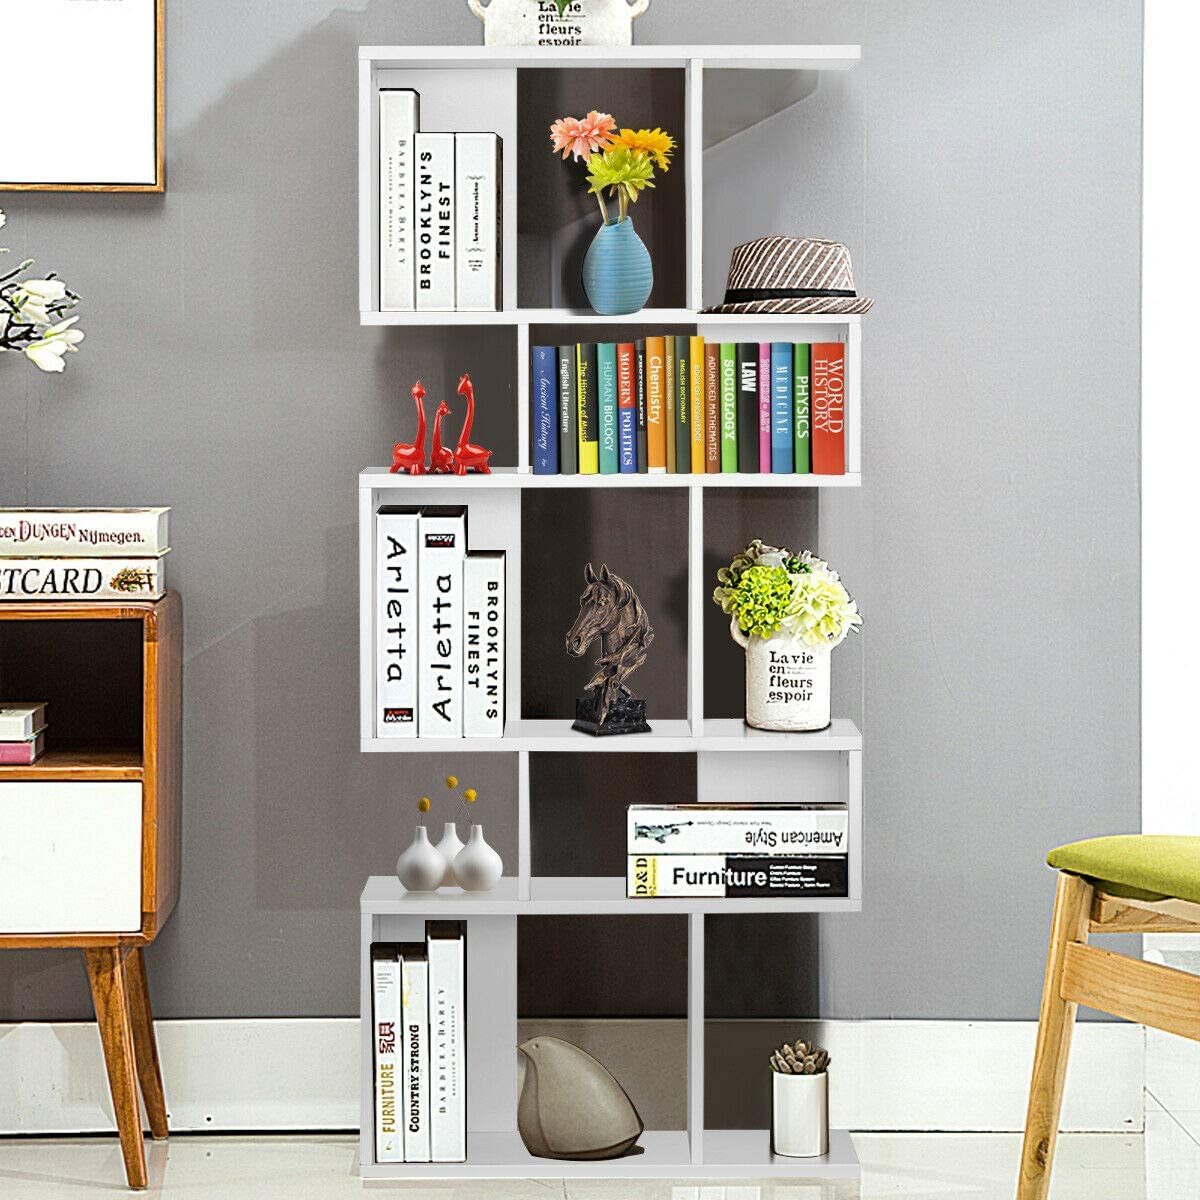 Giantex Freestanding Ladder Bookcase, 5 Cubes Corner Storage Bookshelf, 5-Layer Shelves Closet Organizer Rack Display Cabinet White